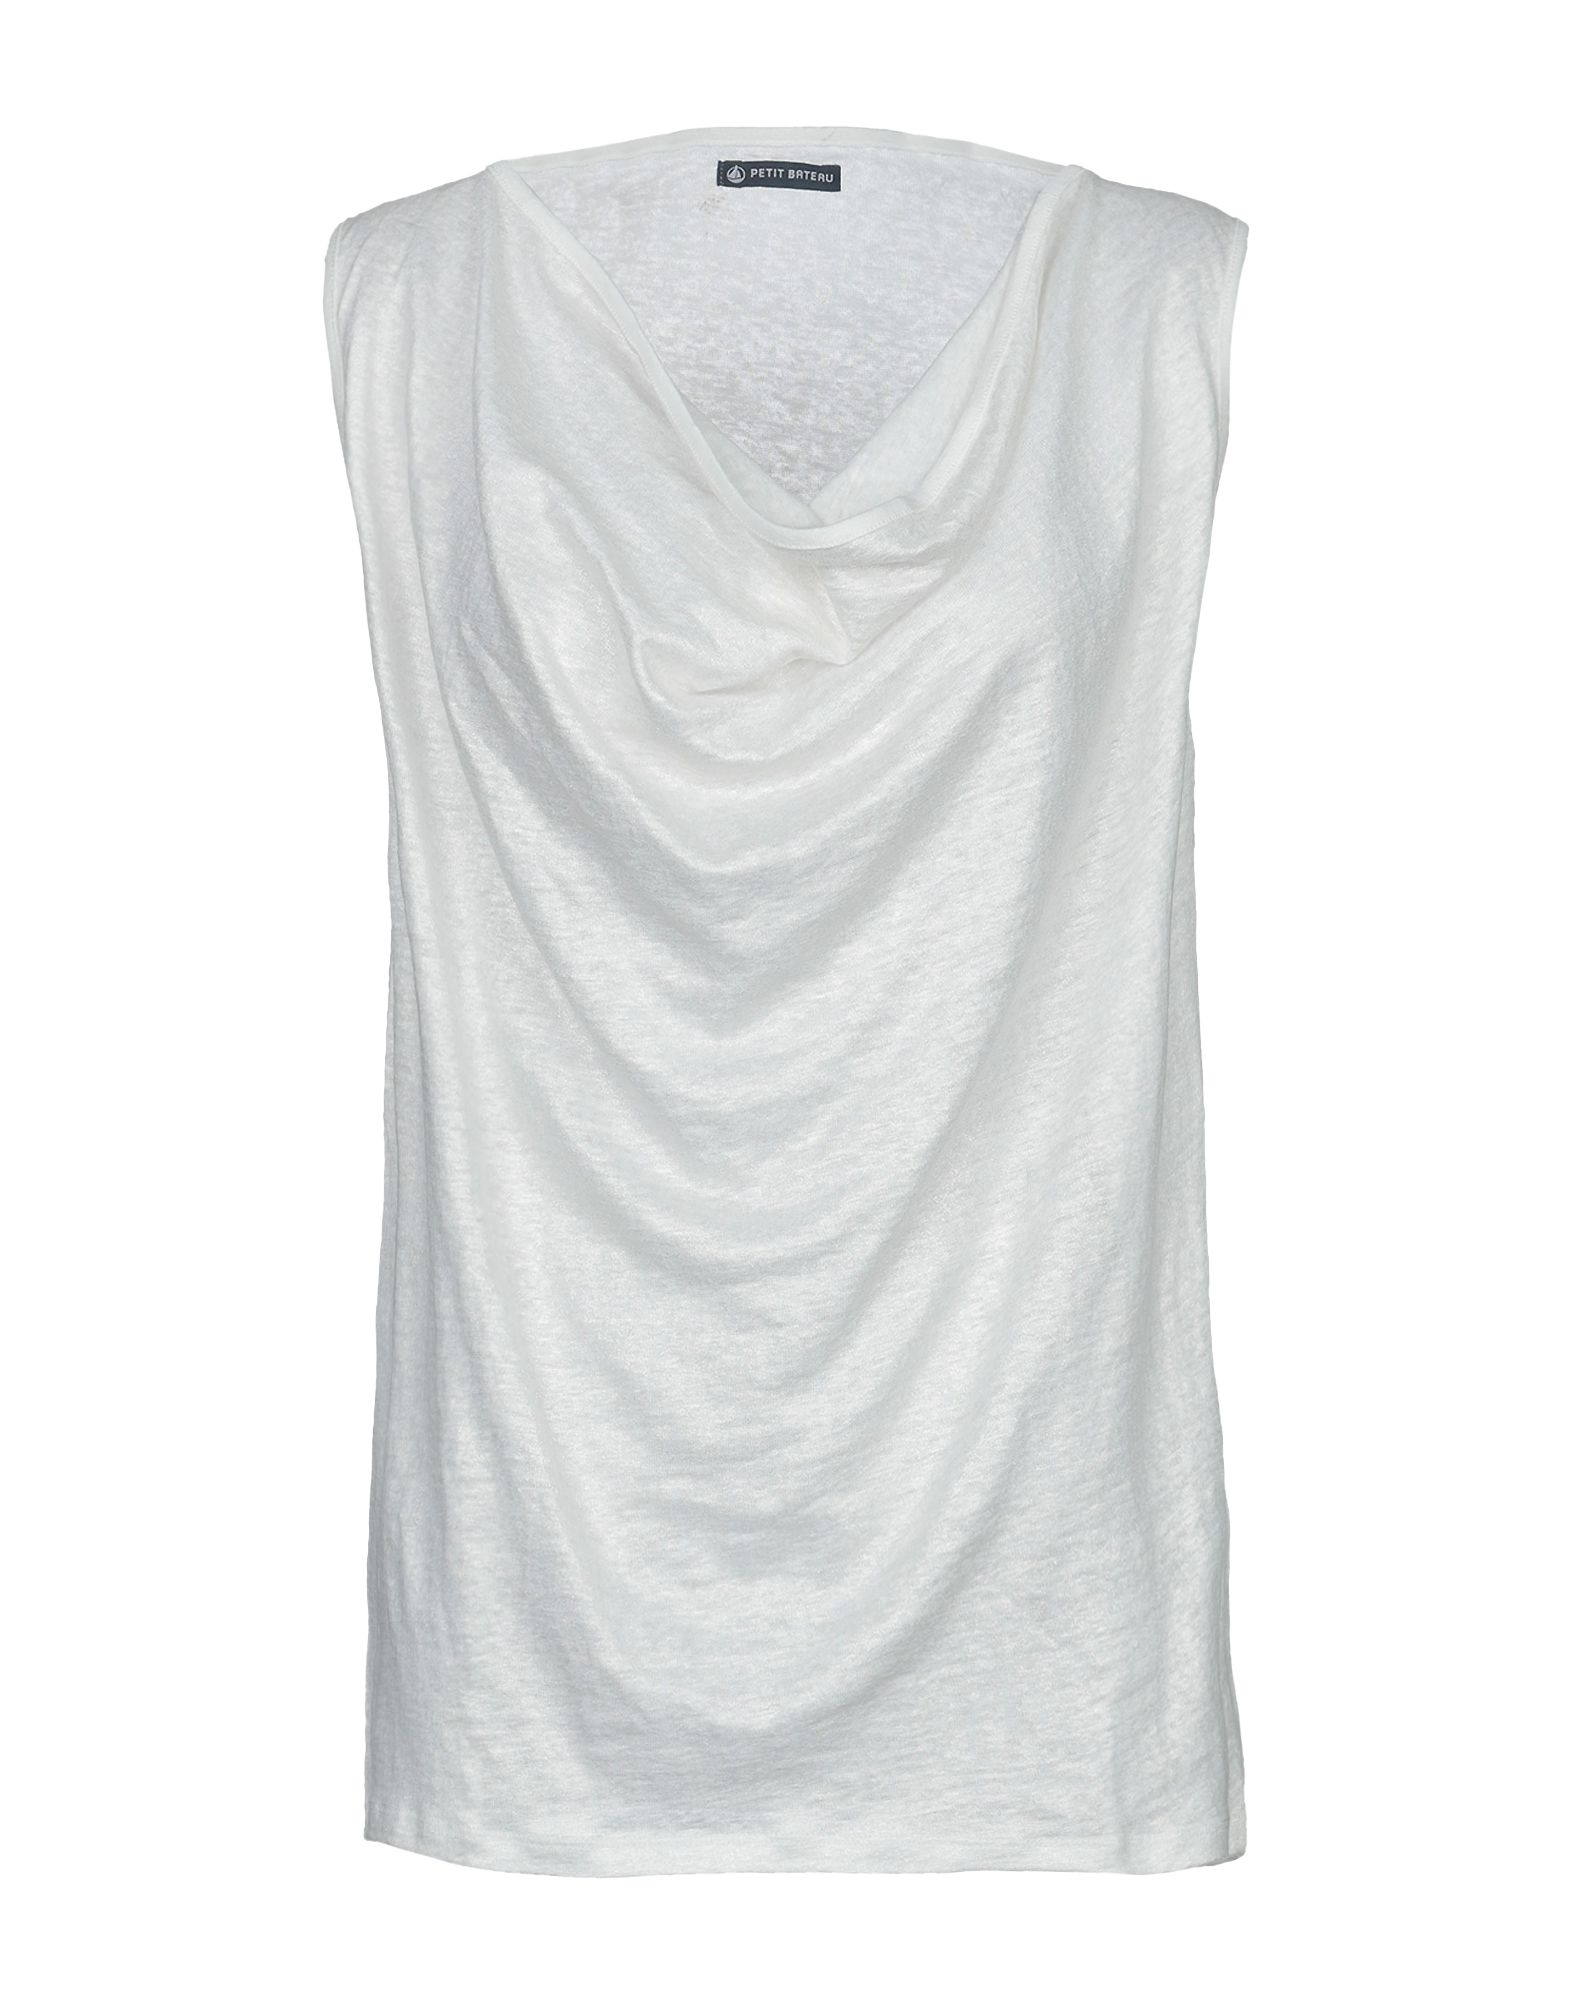 PETIT BATEAU Топ без рукавов light grey slit design bateau long sleeves top